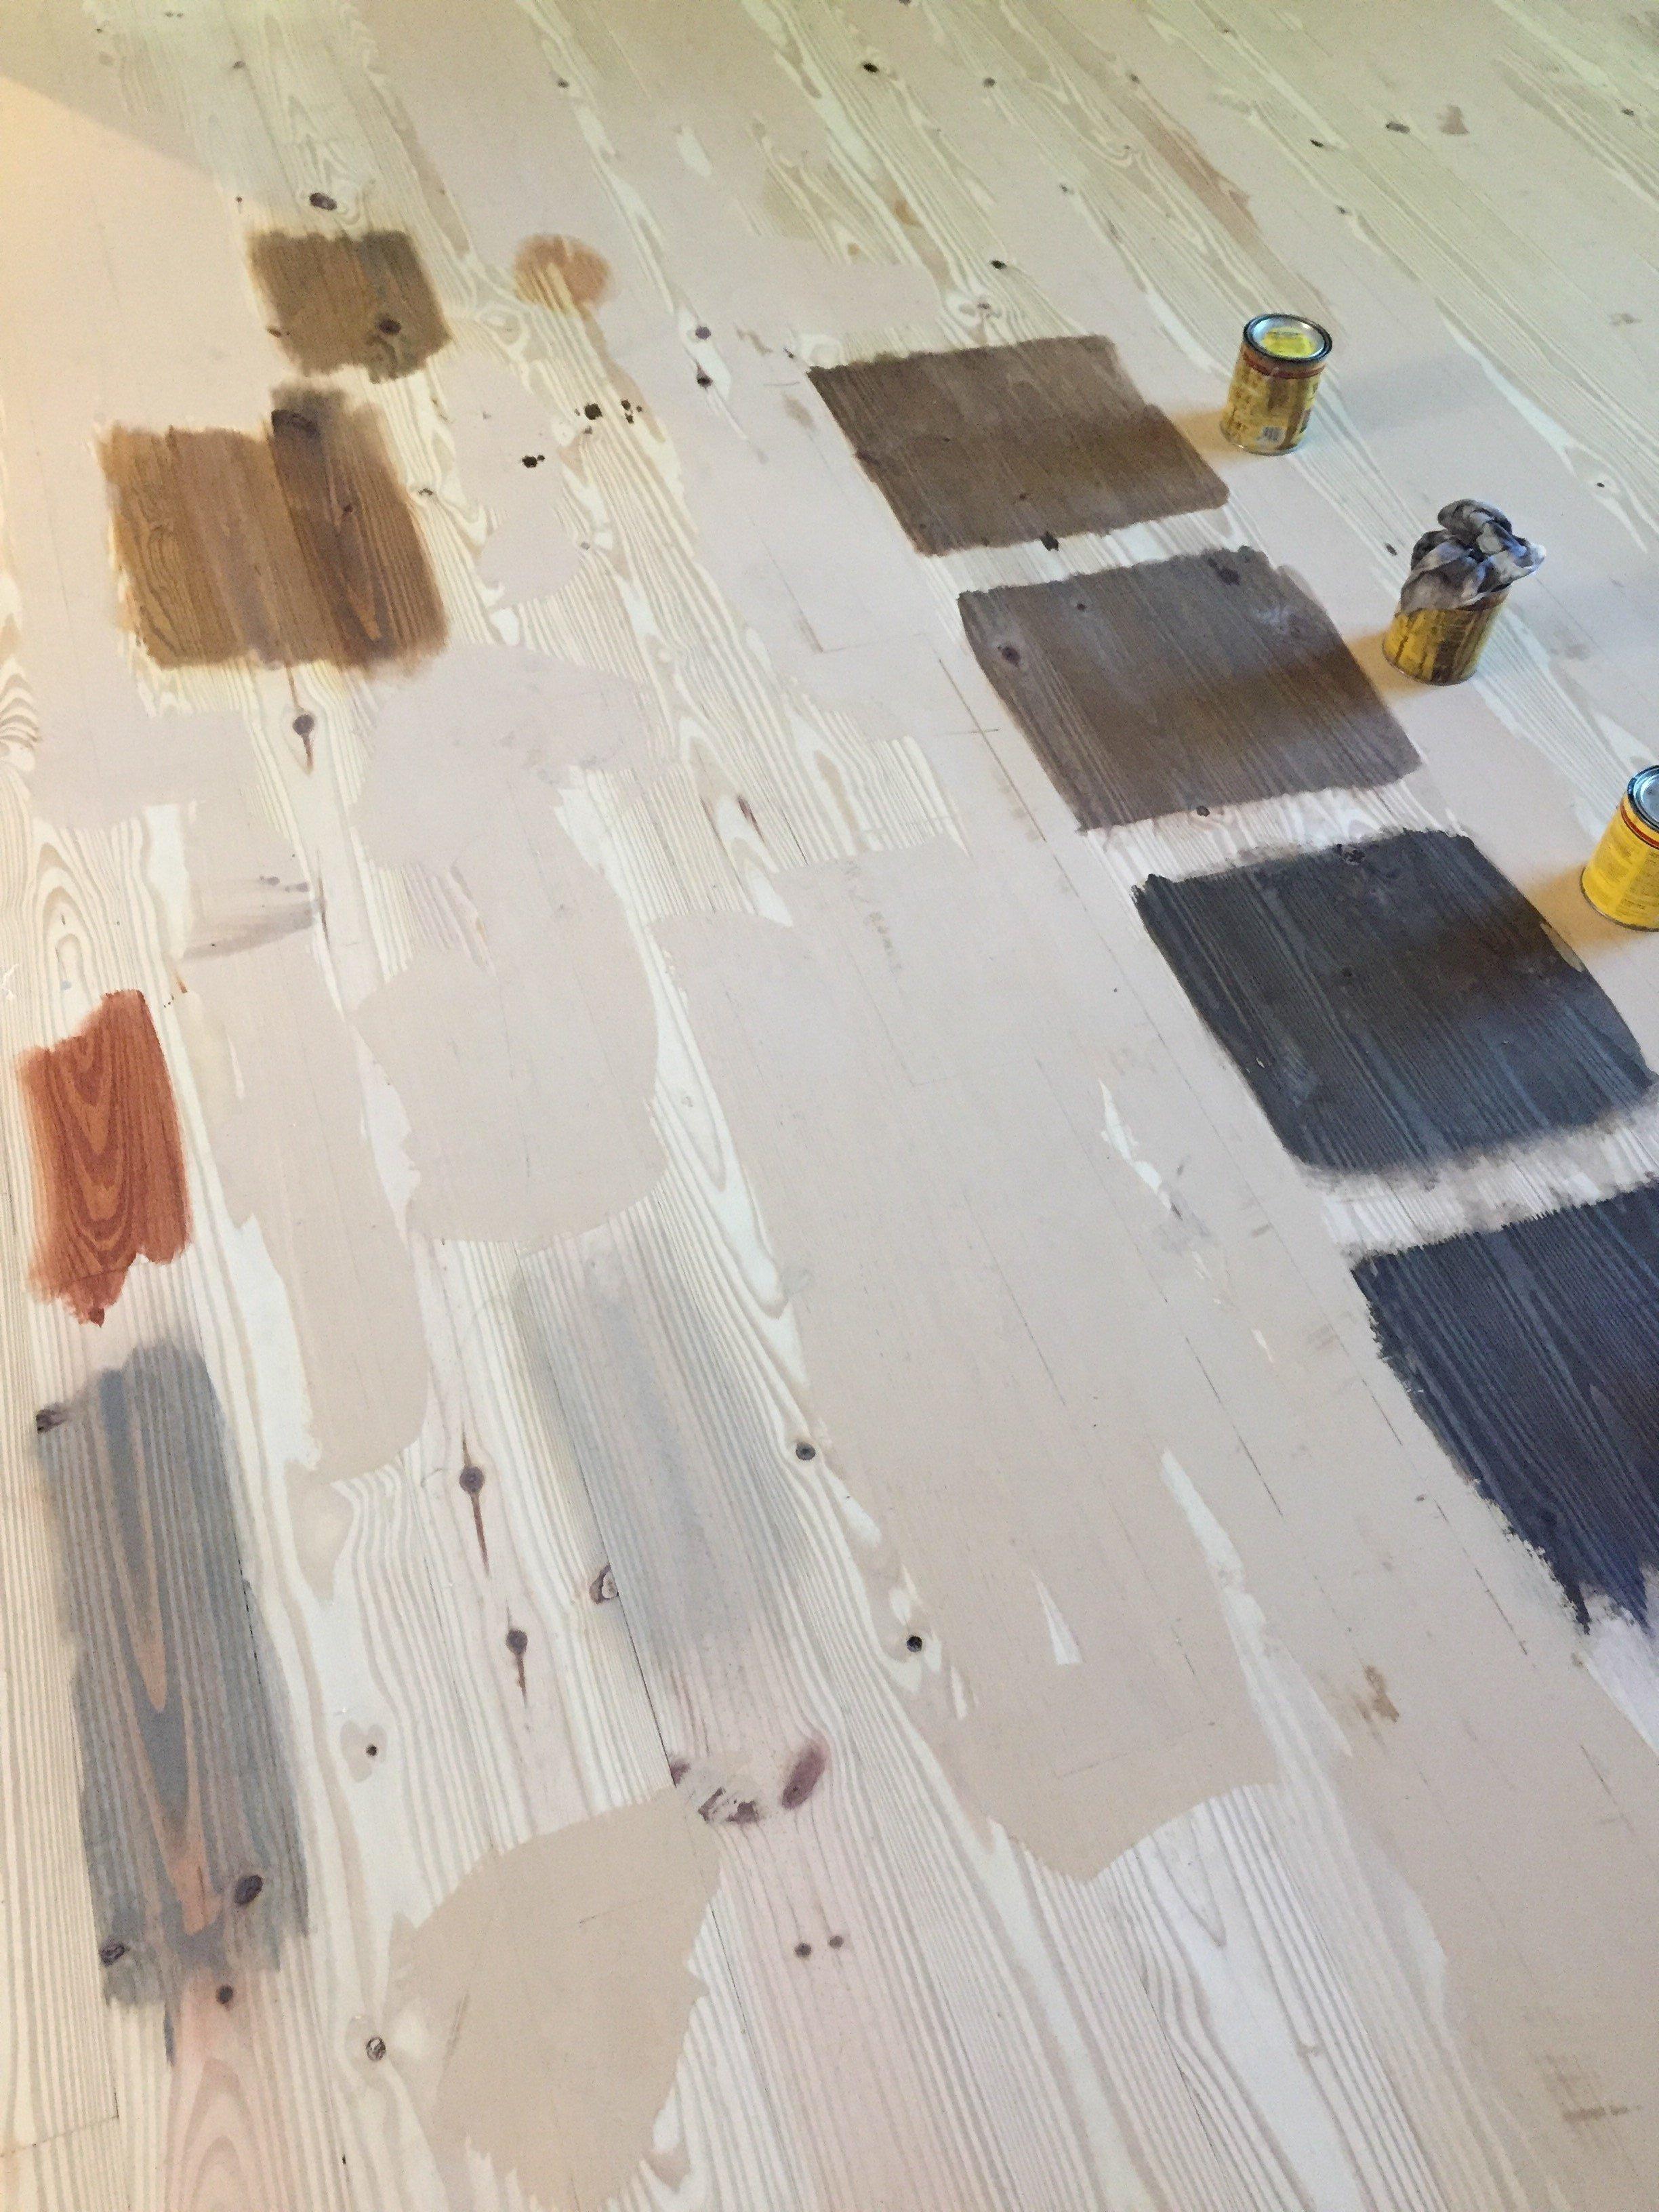 How to Refinish Wood Floors